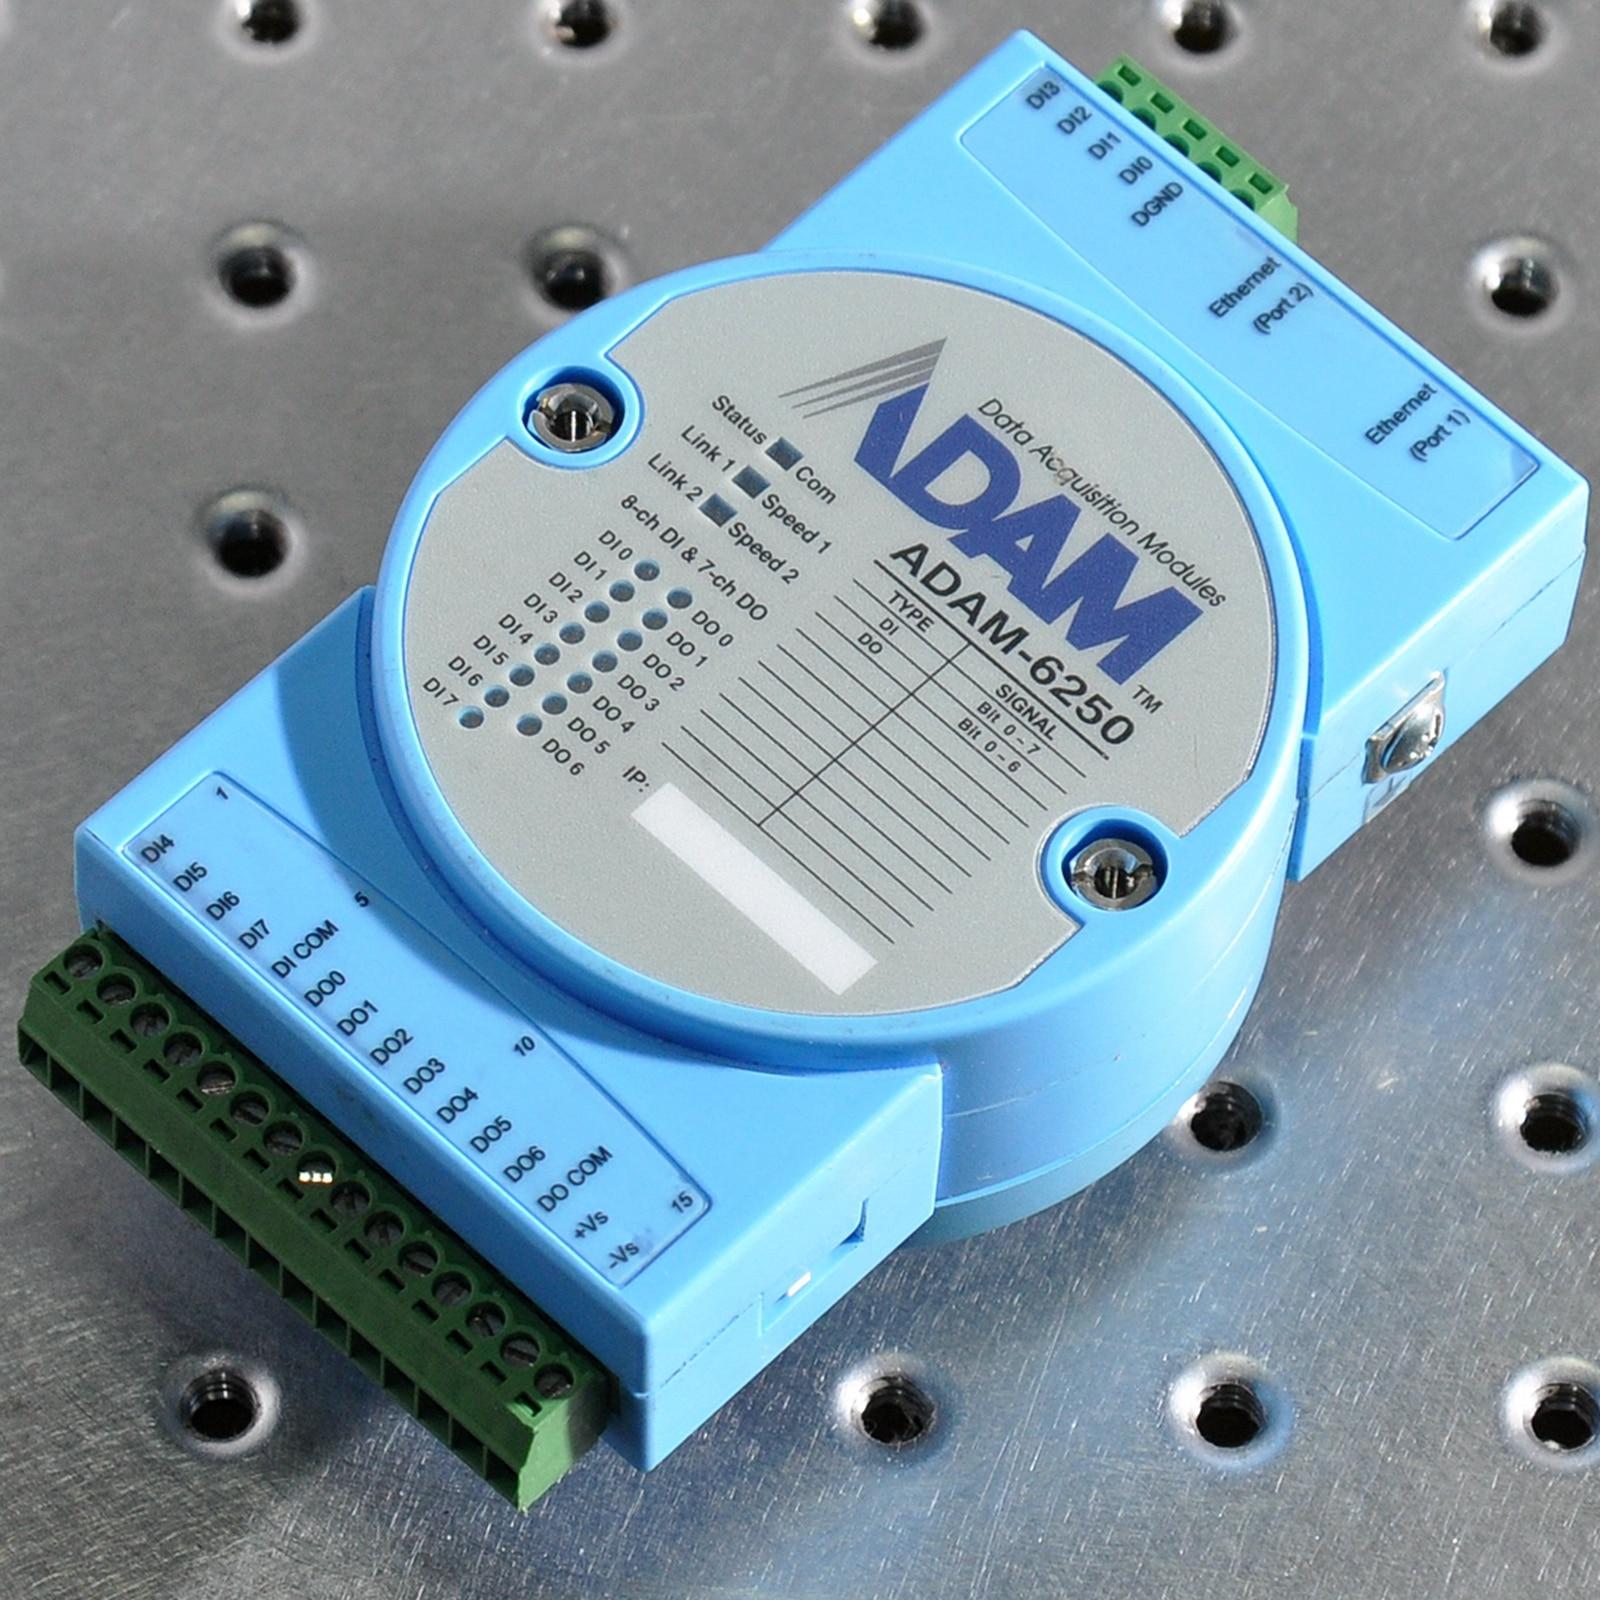 ADVANTECH ADAM-6250 5-port unmanaged industrial Ethernet switch